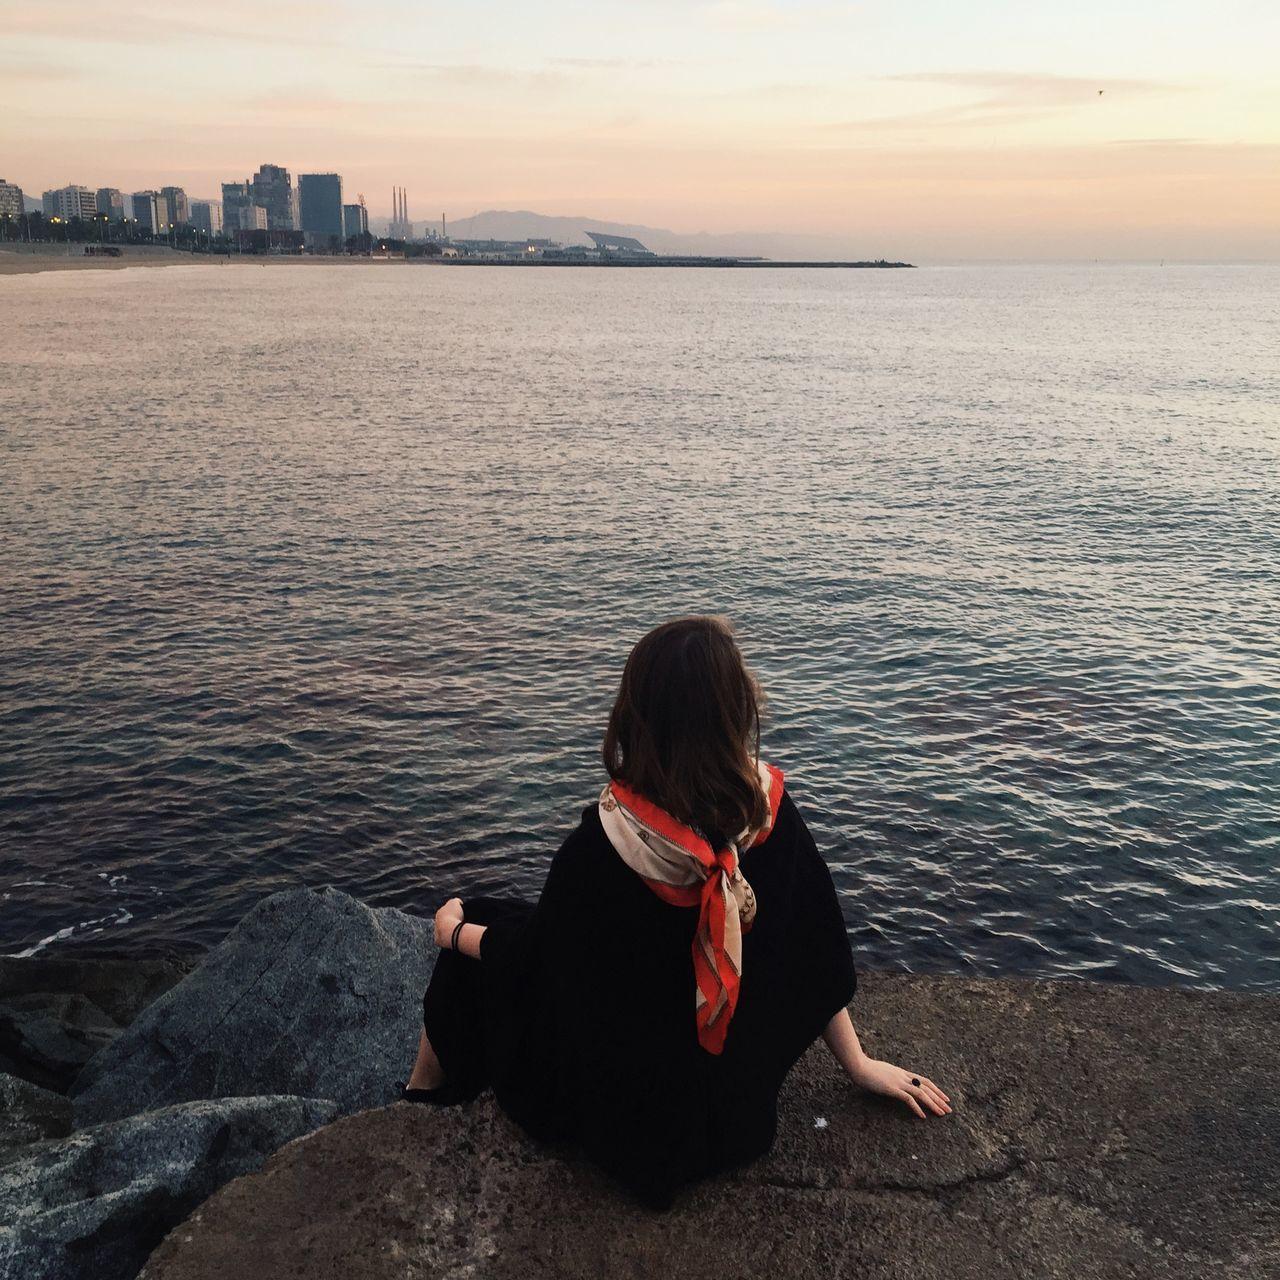 Rear view of woman enjoying sea view during sunset